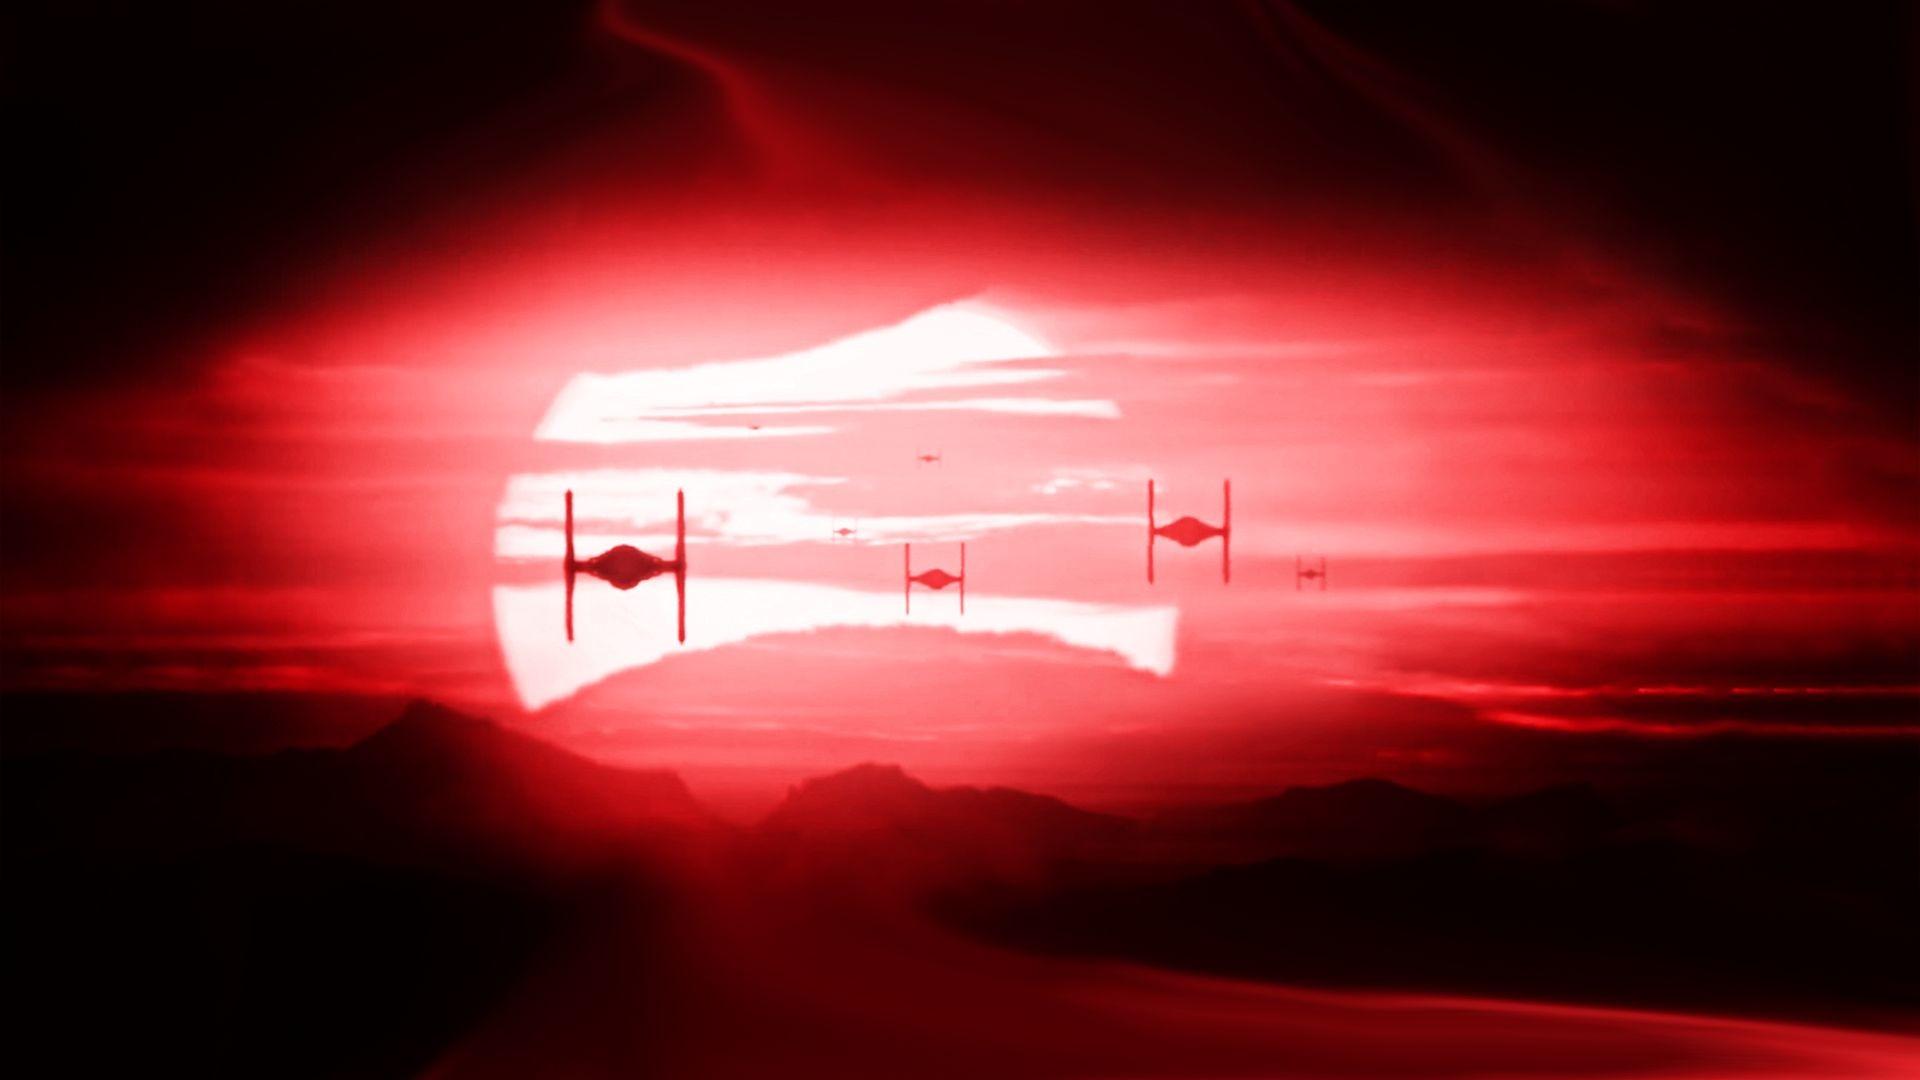 Star Wars First Order Wallpaper 69 Images